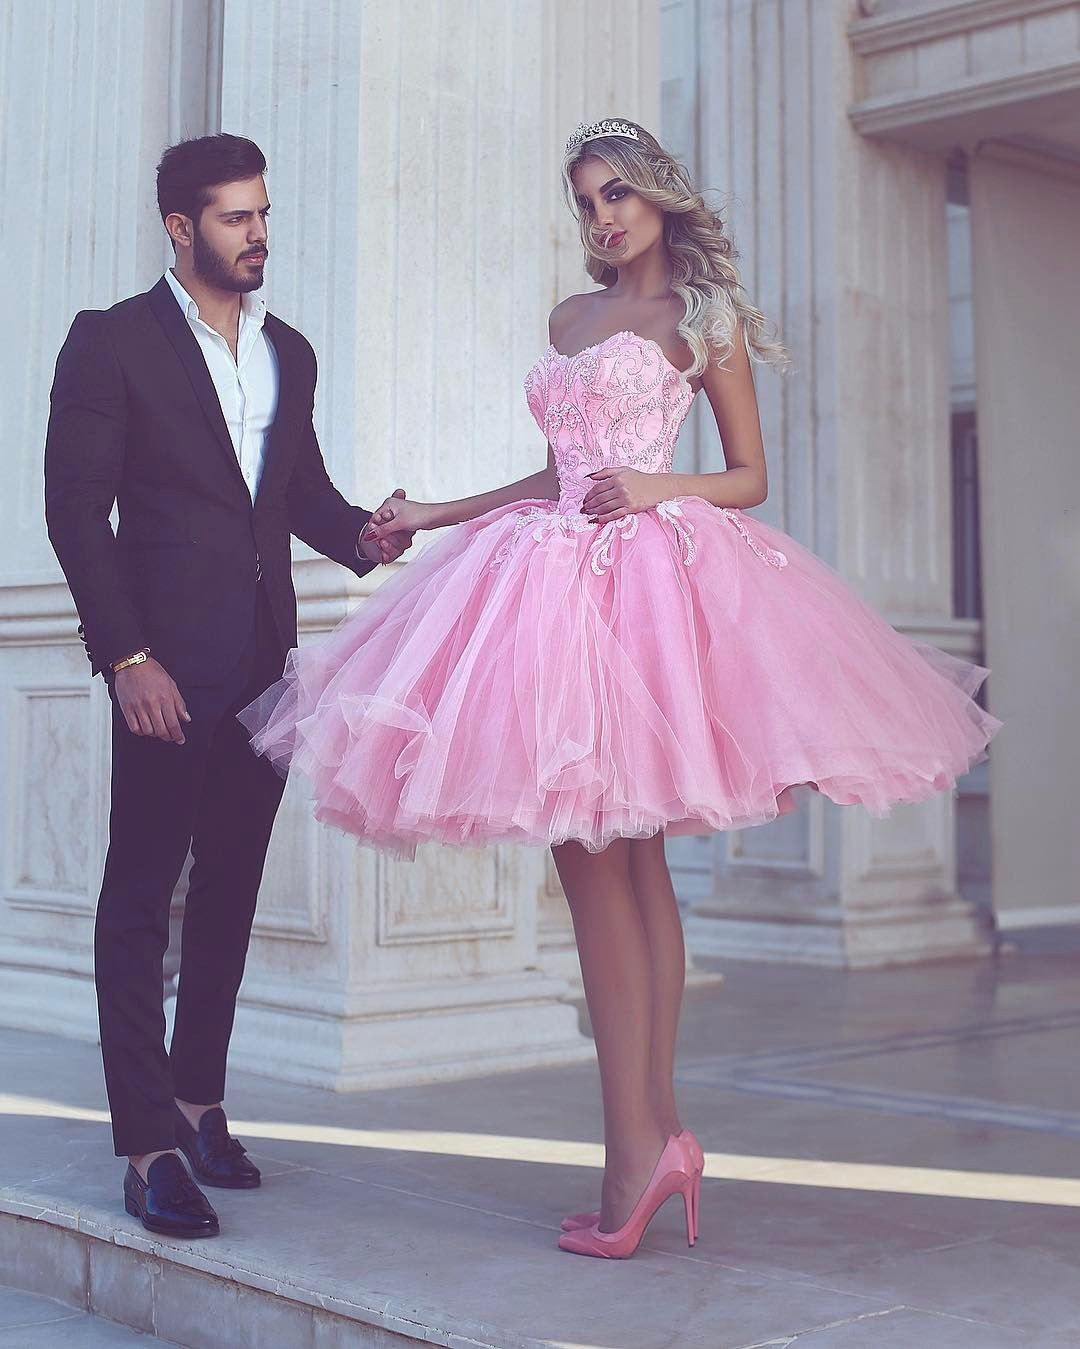 Arabic Short Prom Dresses 2017 Sexy   Rosa, Pantalones cortos y ...